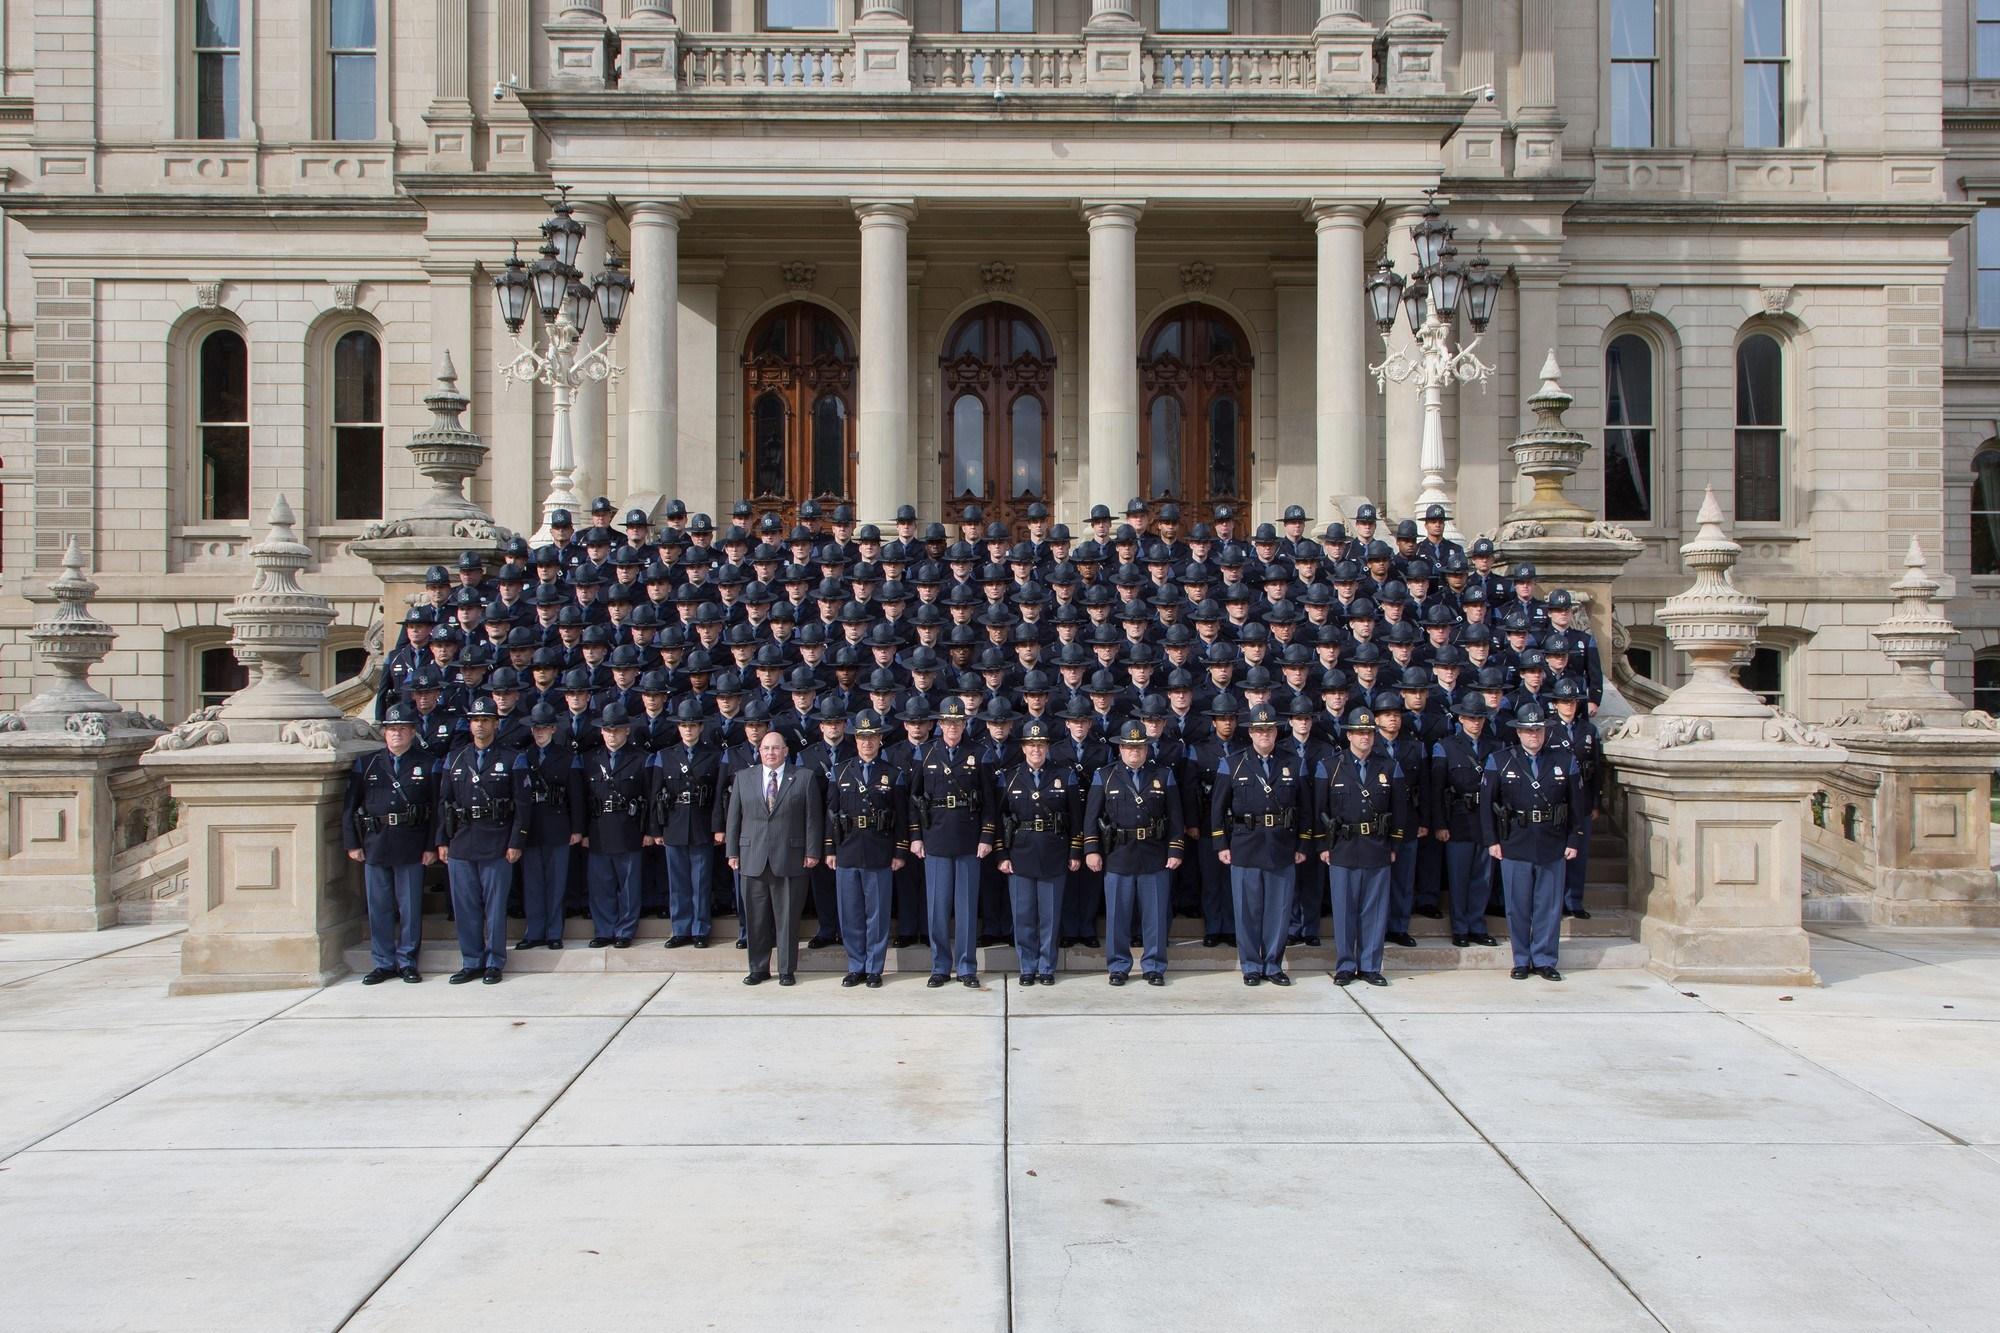 133rd Trooper Recruit School (Source: Michigan State Police)